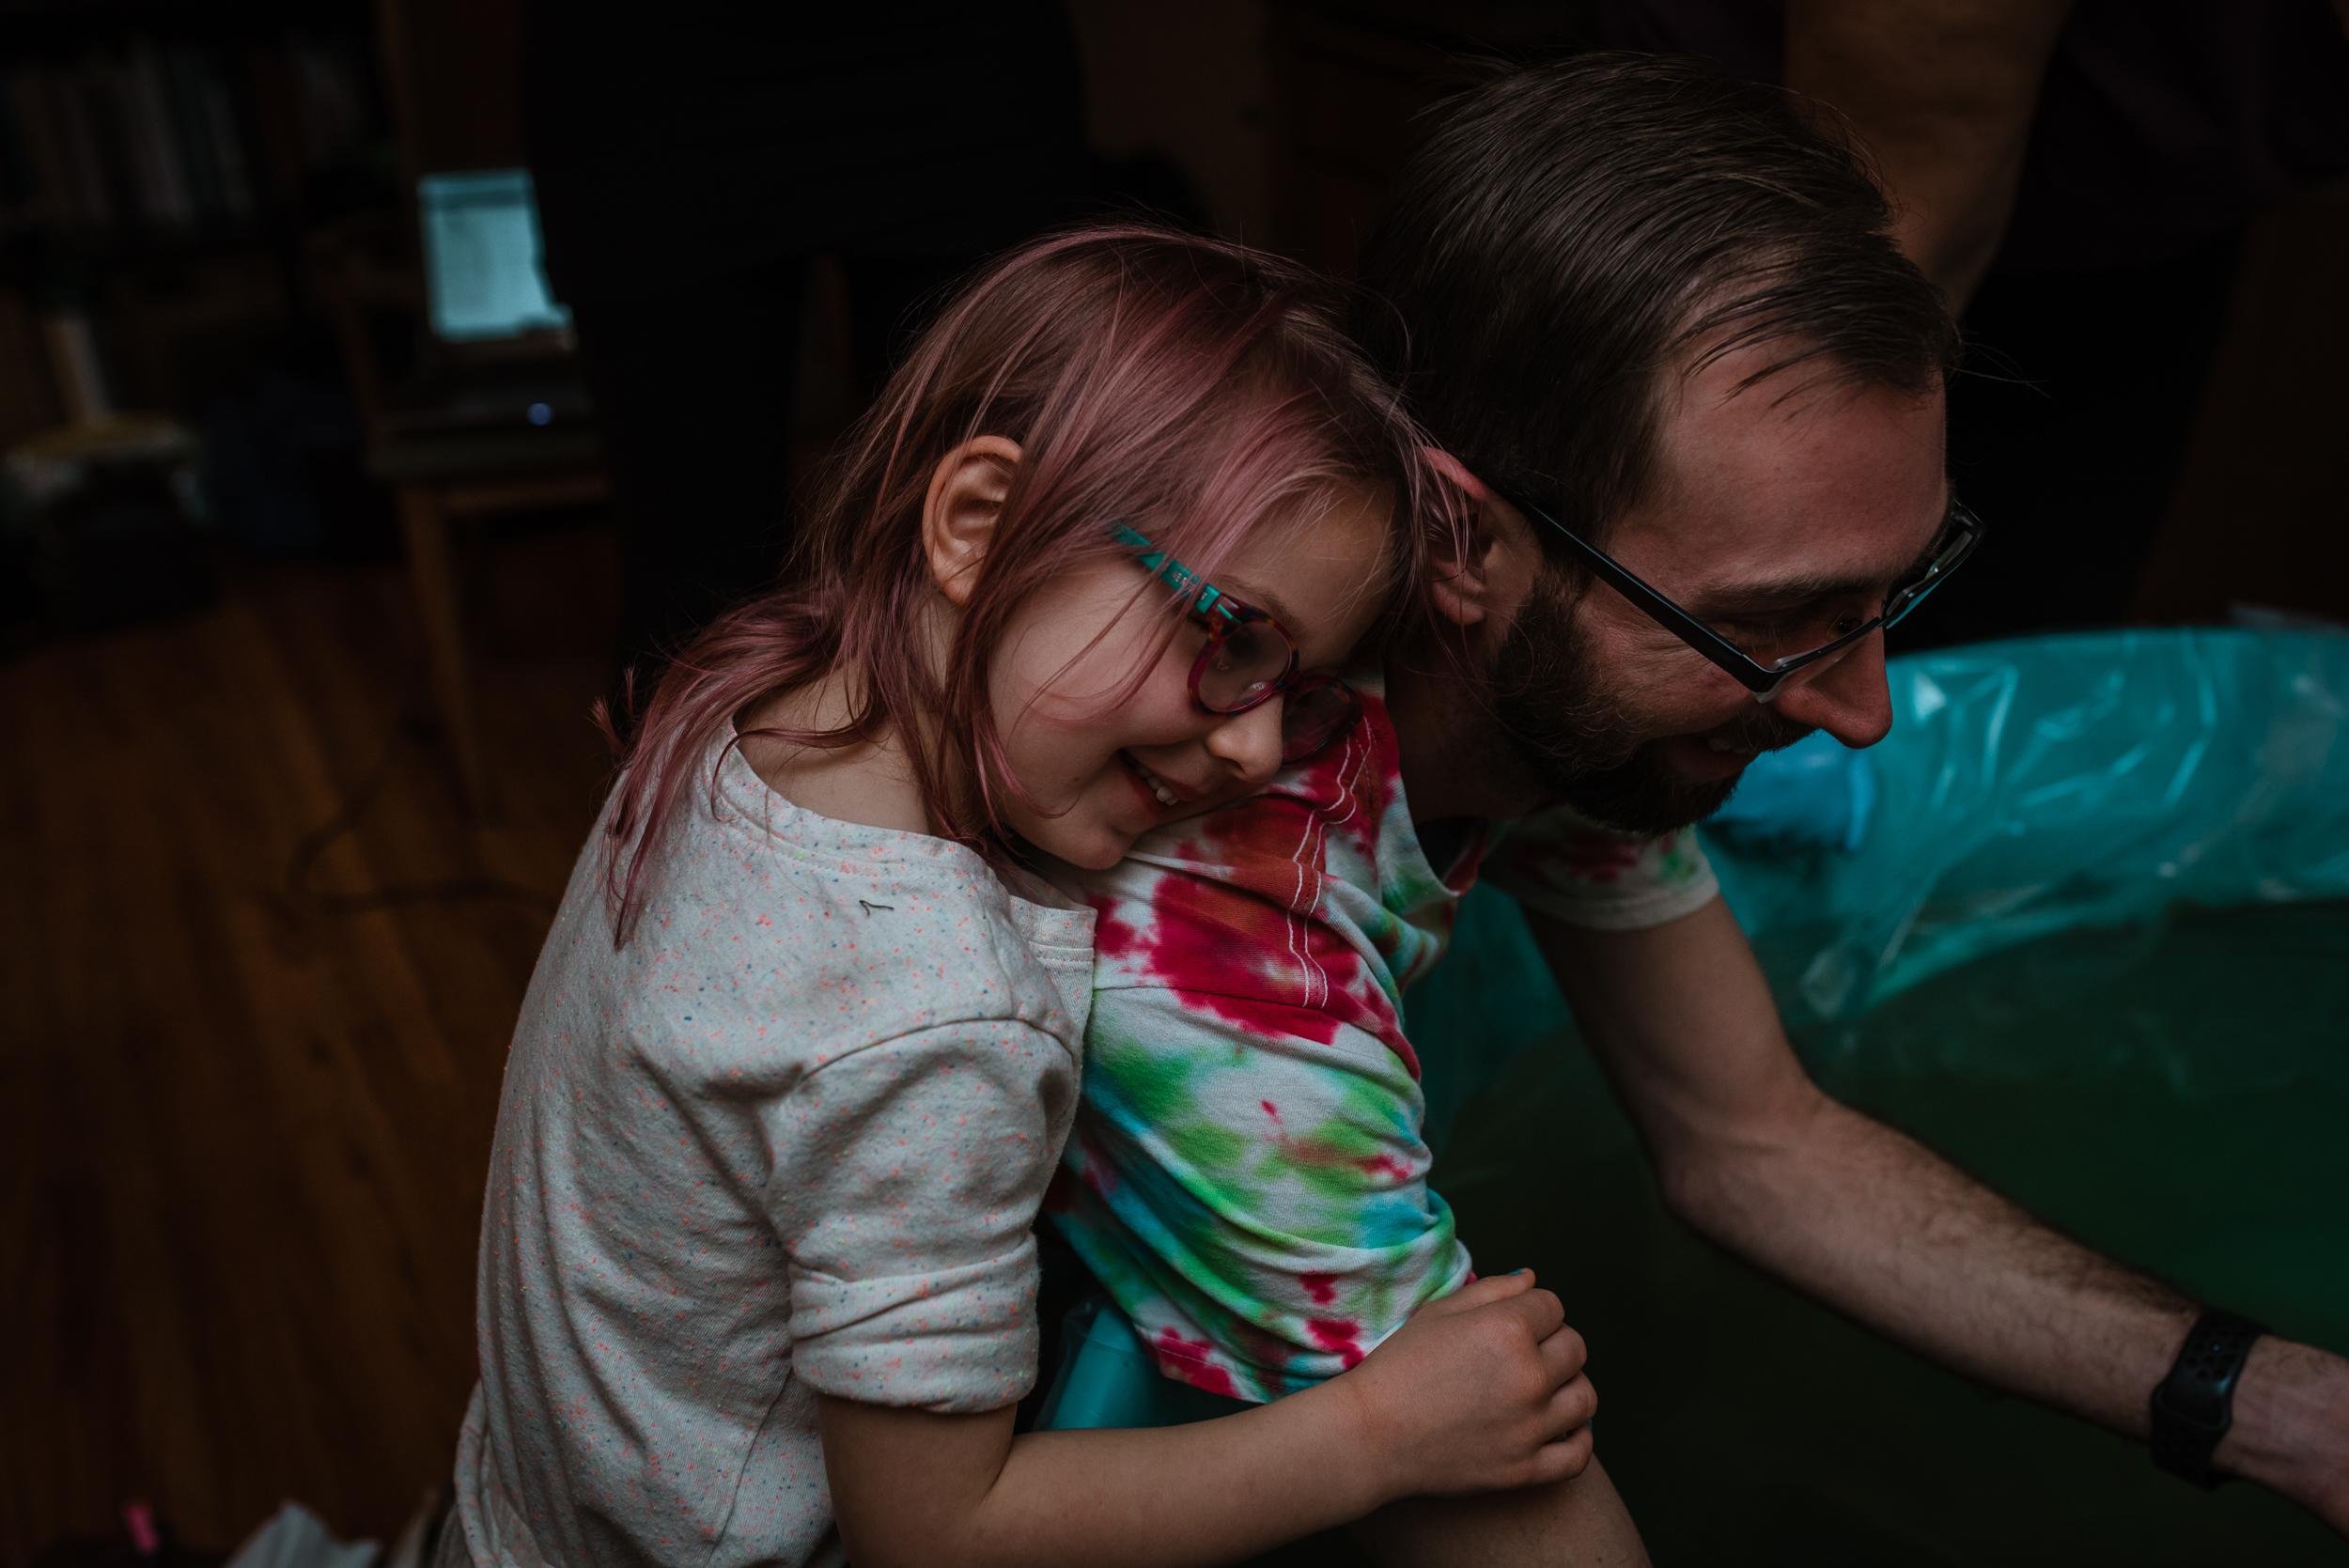 Meredith Westin Photography- Minneapolis Birth Stories and Films-November 08, 2018-190523.jpg